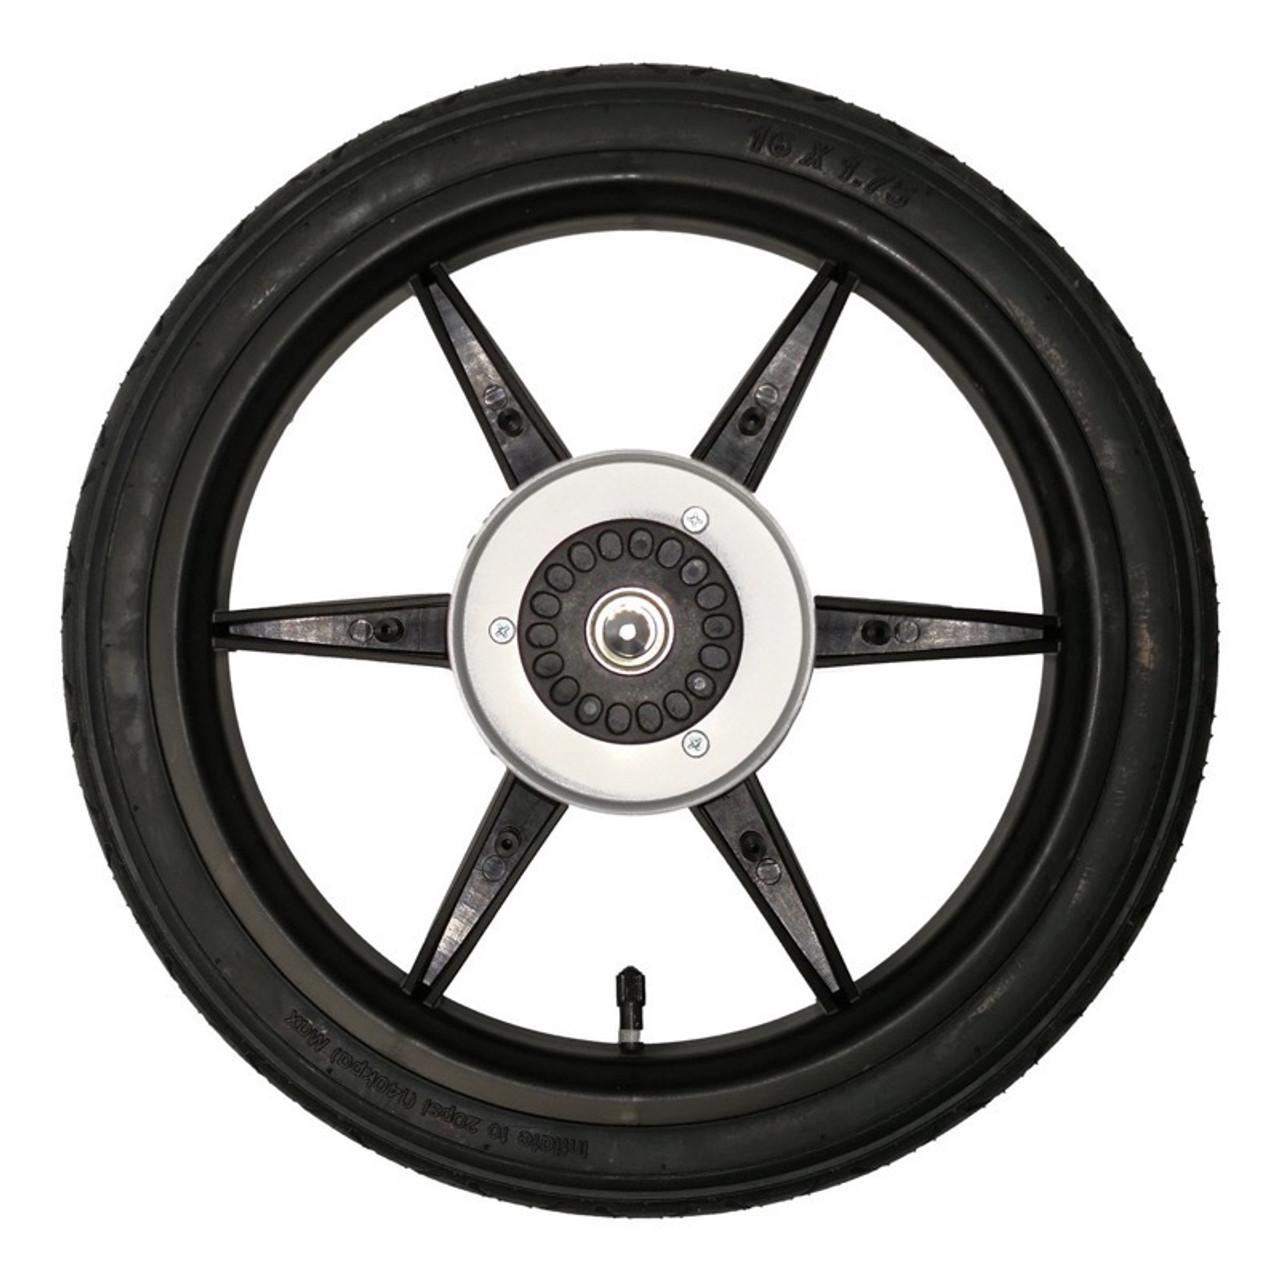 "Mountain Buggy - 16"" Complete Rear Wheel - suits Terrain (2015+ models)"